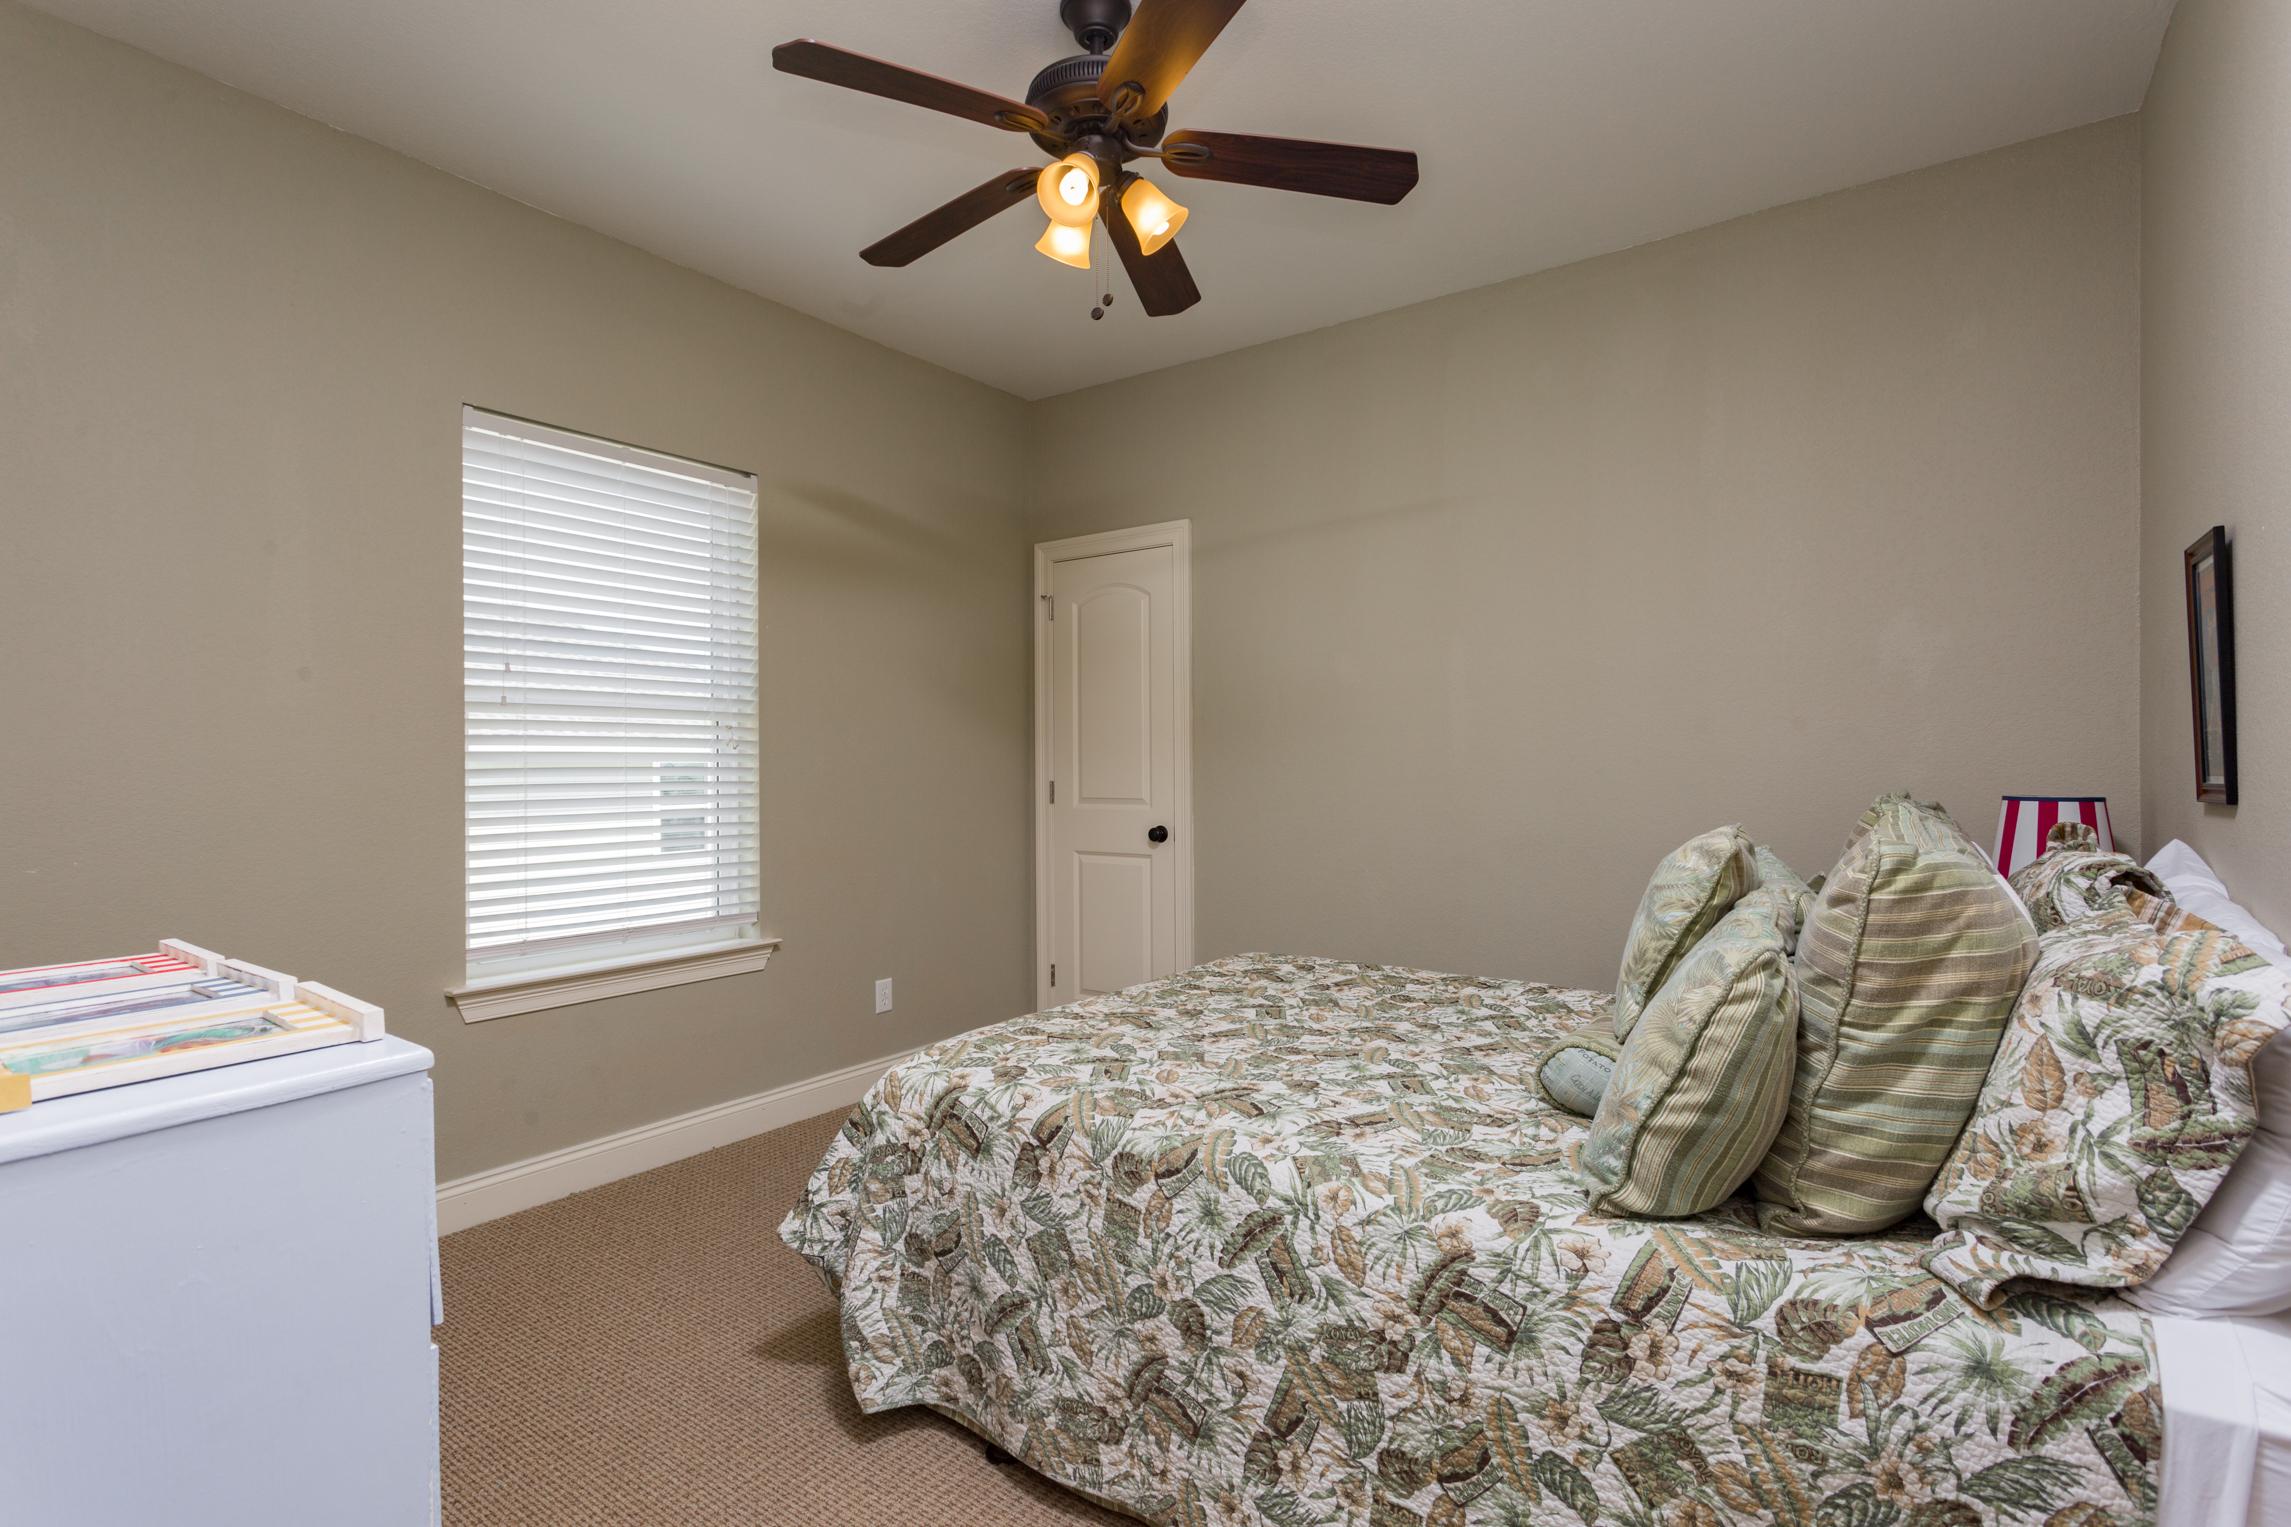 Maldonado 500 House/Cottage rental in Pensacola Beach House Rentals in Pensacola Beach Florida - #22